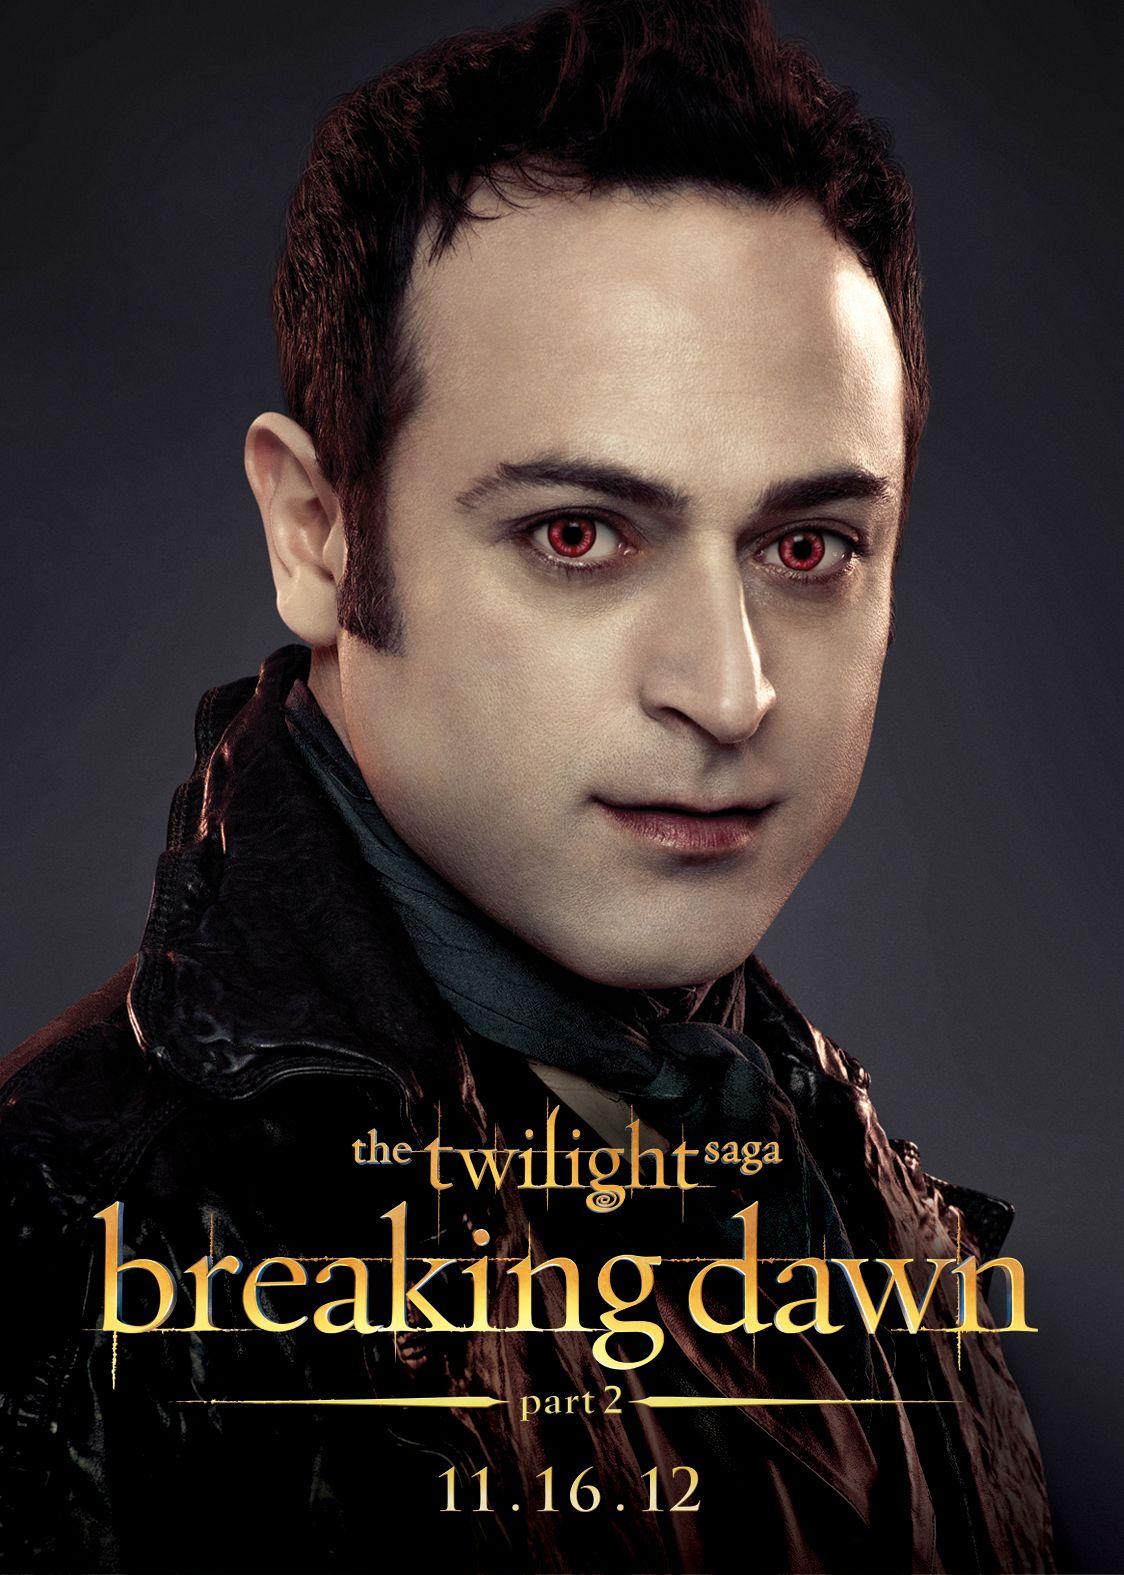 twilight saga breaking dawn part 2 full movie download free